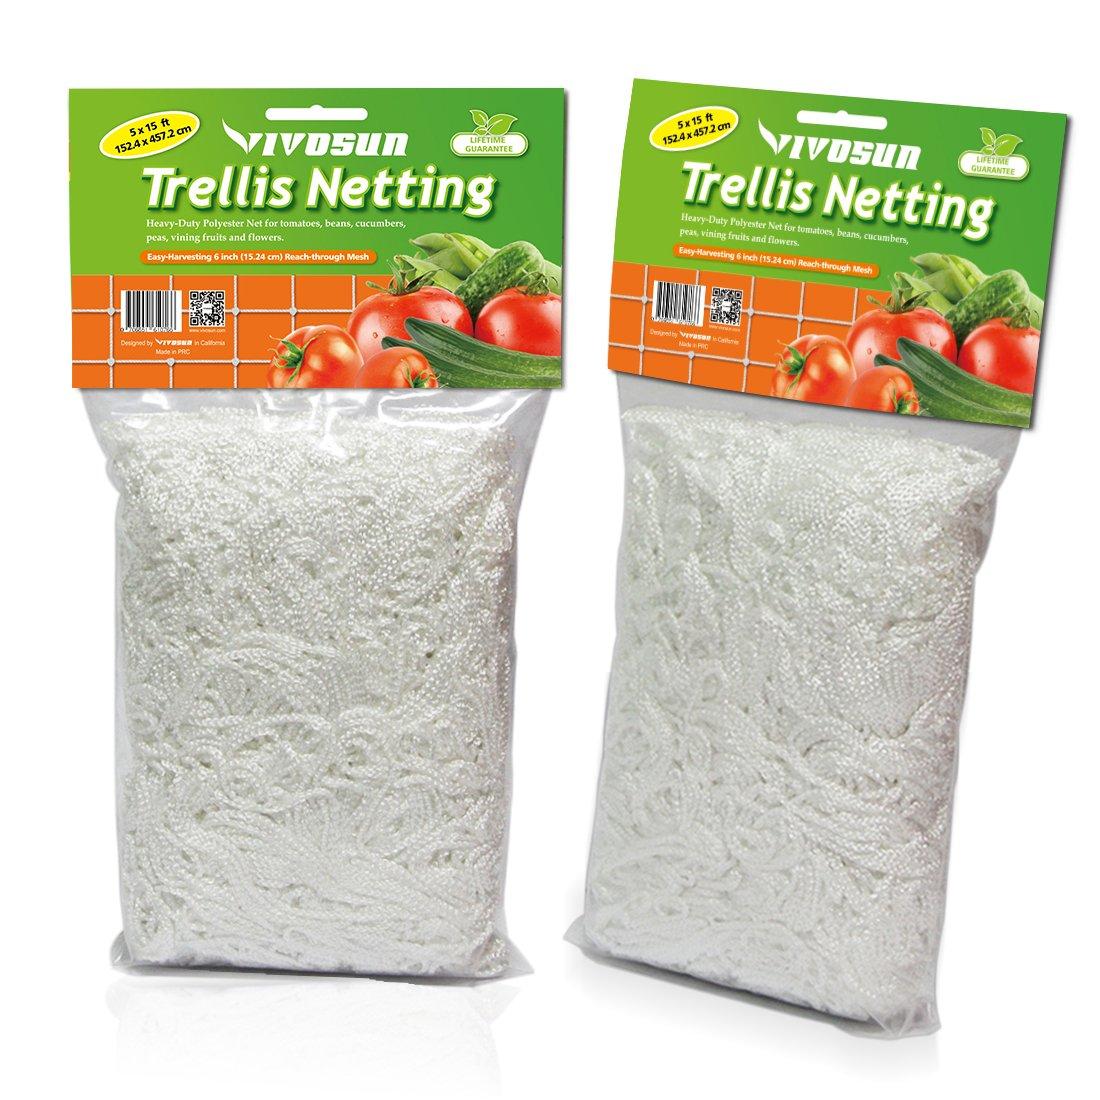 VIVOSUN Heavy-Duty Polyester Plant Trellis Netting 5 x 15ft 2 Pack